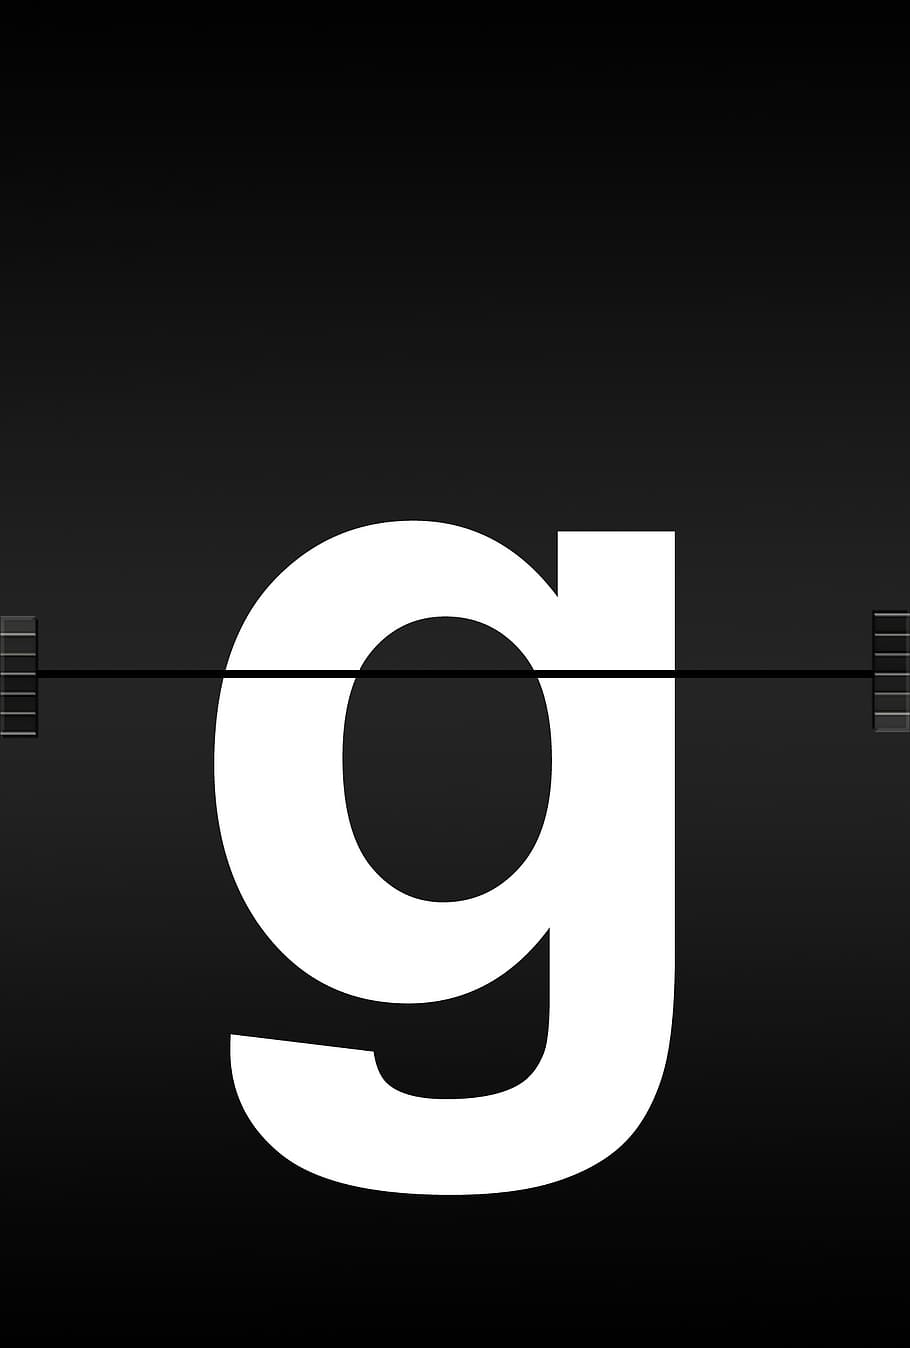 Logo Huruf G : huruf, Wallpaper:, Letter, Text,, Letters,, Alphabet,, Journal, Font,, Airport, Wallpaper, Flare